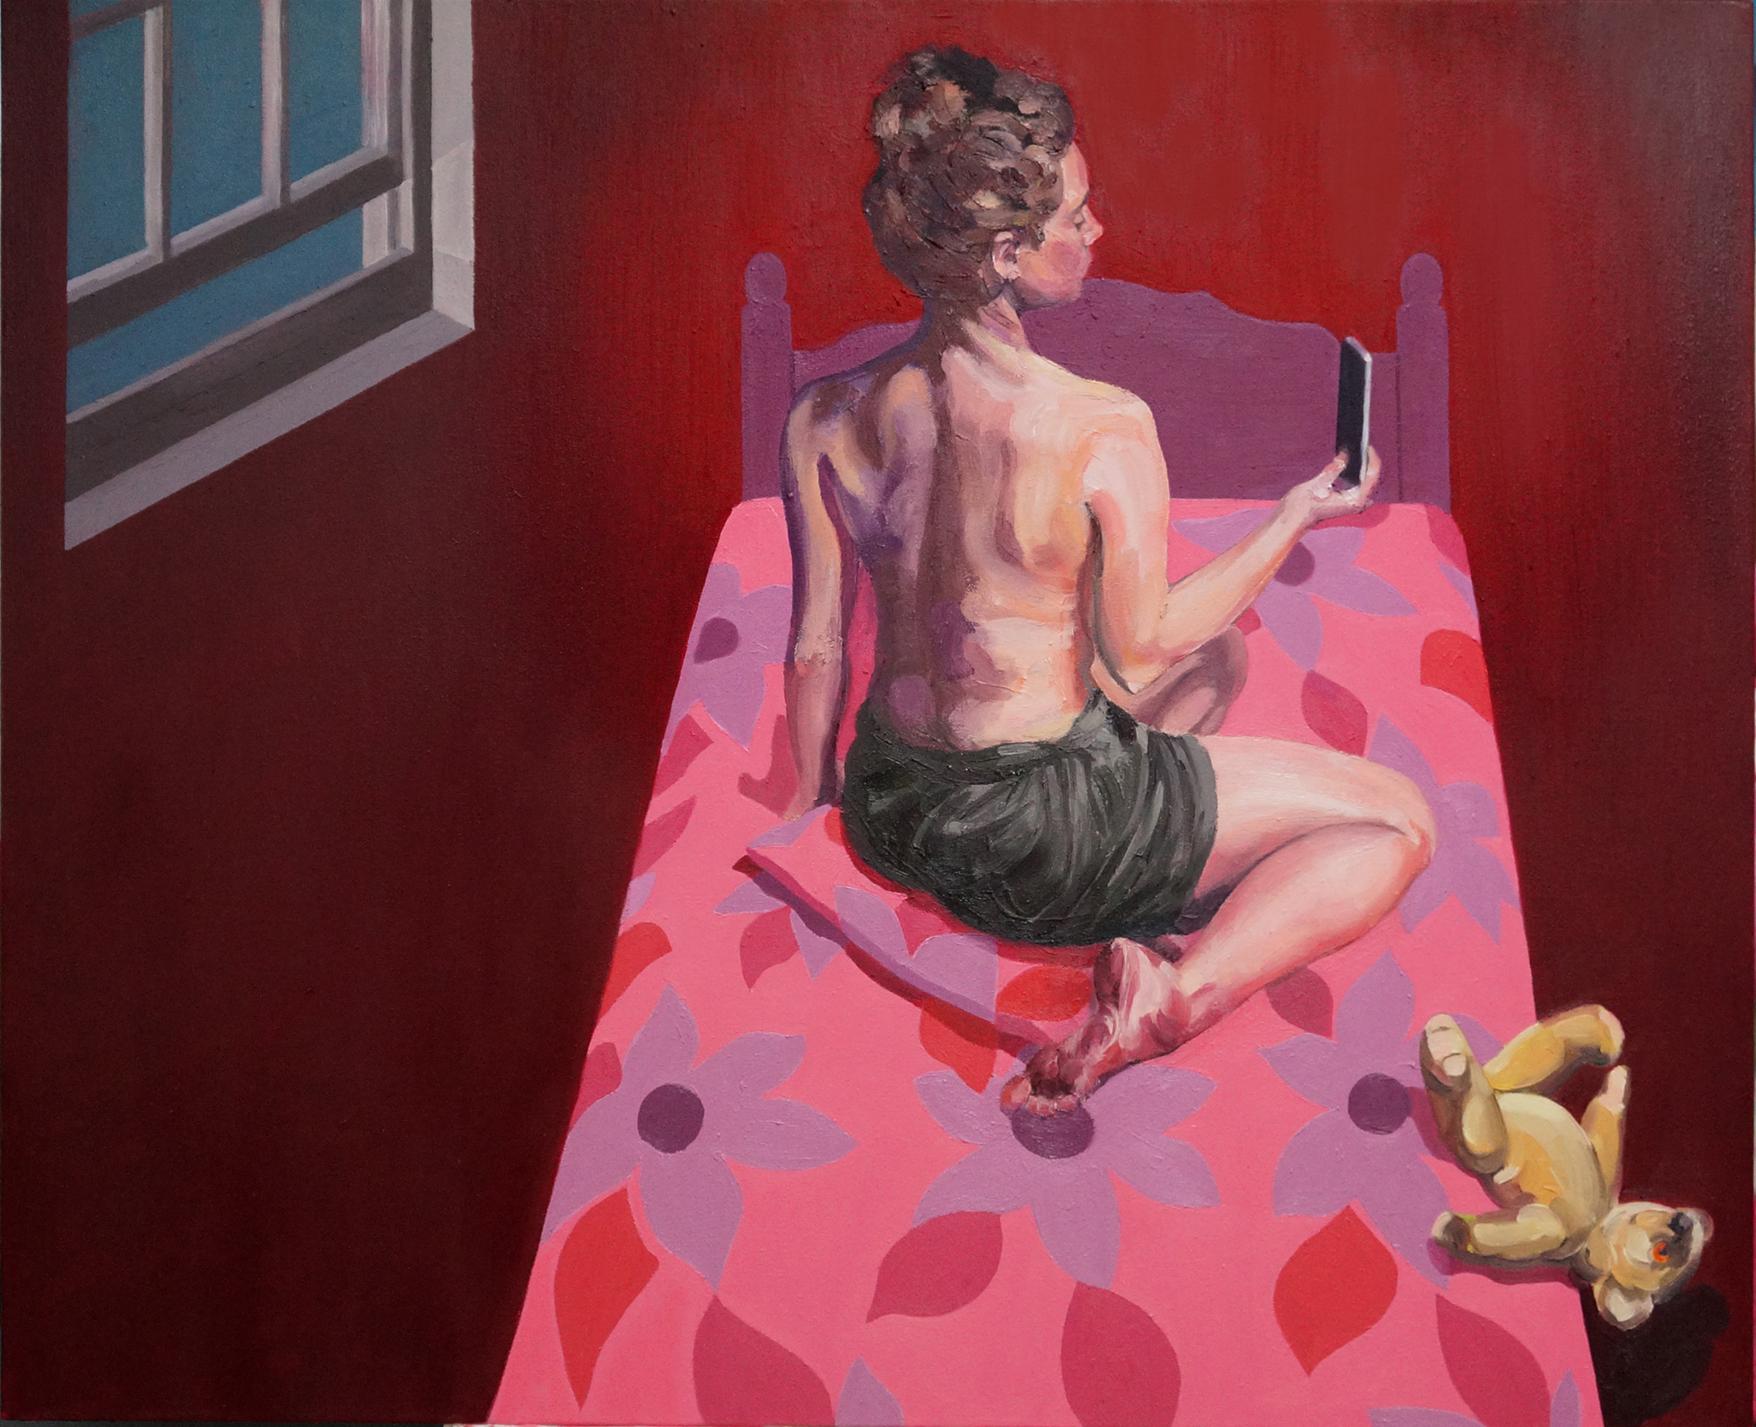 Richard Tomlin, The Hour between Dog and Wolf 1, Oils on canvas, 81 x 98 x 2cms,  http://www.richardtomlin.co.uk